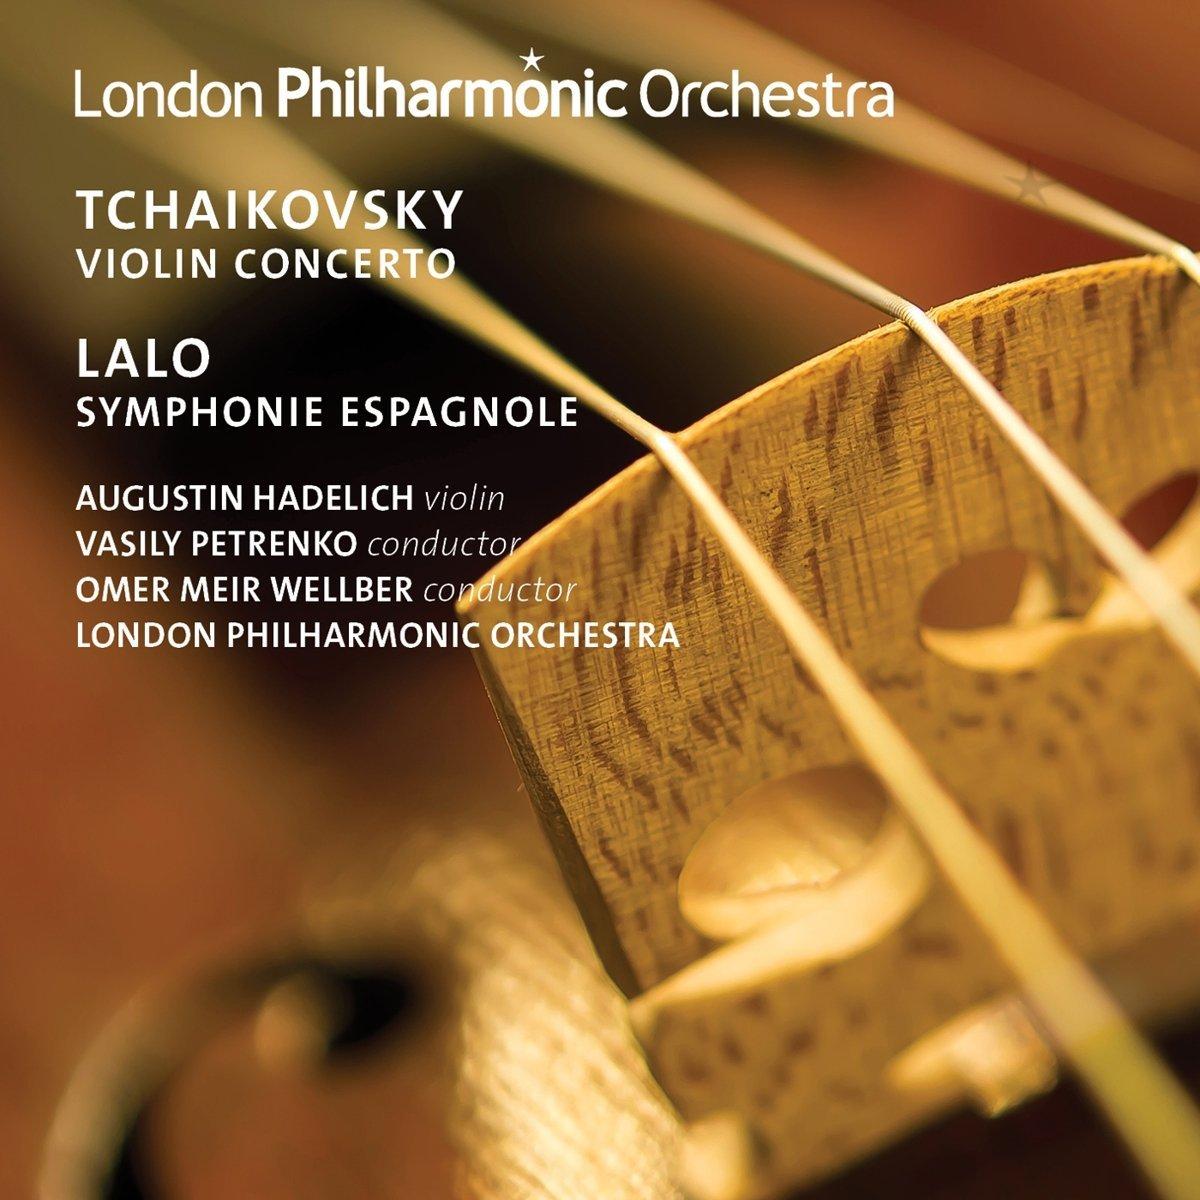 London Philharmonic Orchestra Tchaikovsky